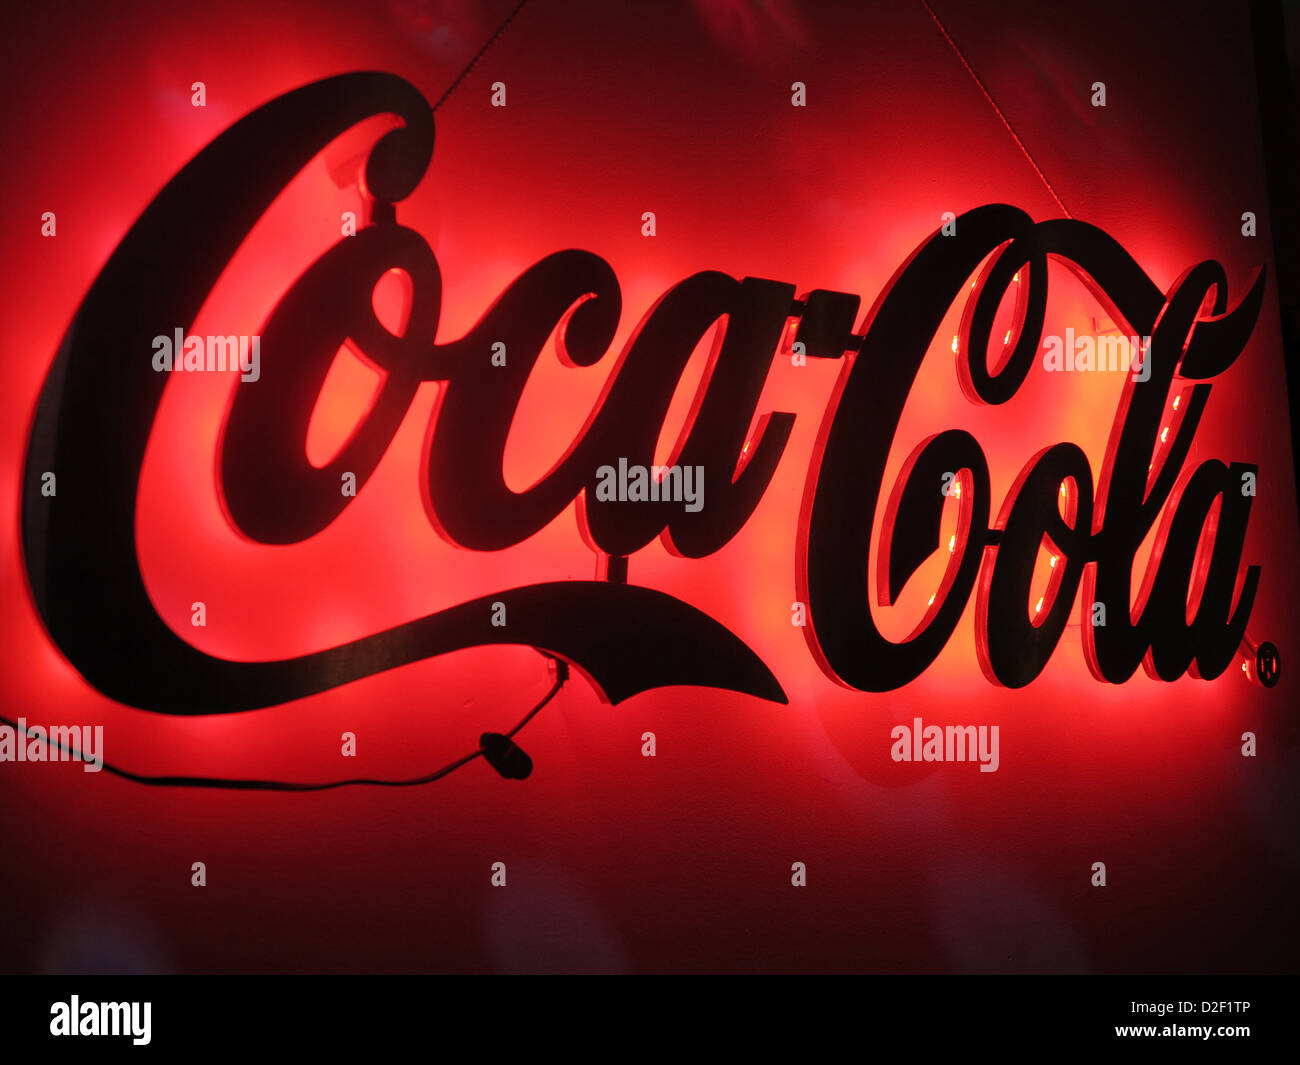 Coca Cola sign Saint Petersburg. Russia. - Stock Image